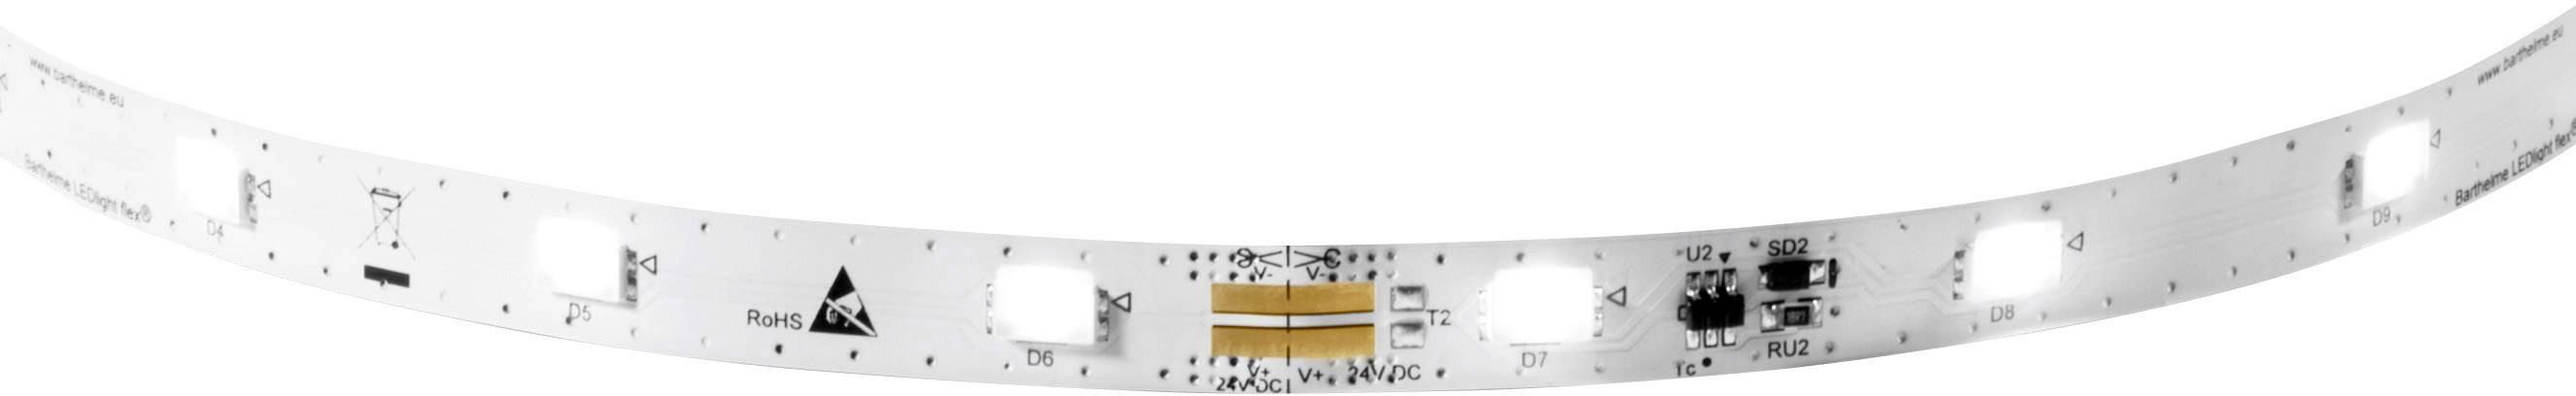 LED pásek Barthelme 50329428 50329428, 24 V, teplá bílá, 600 cm